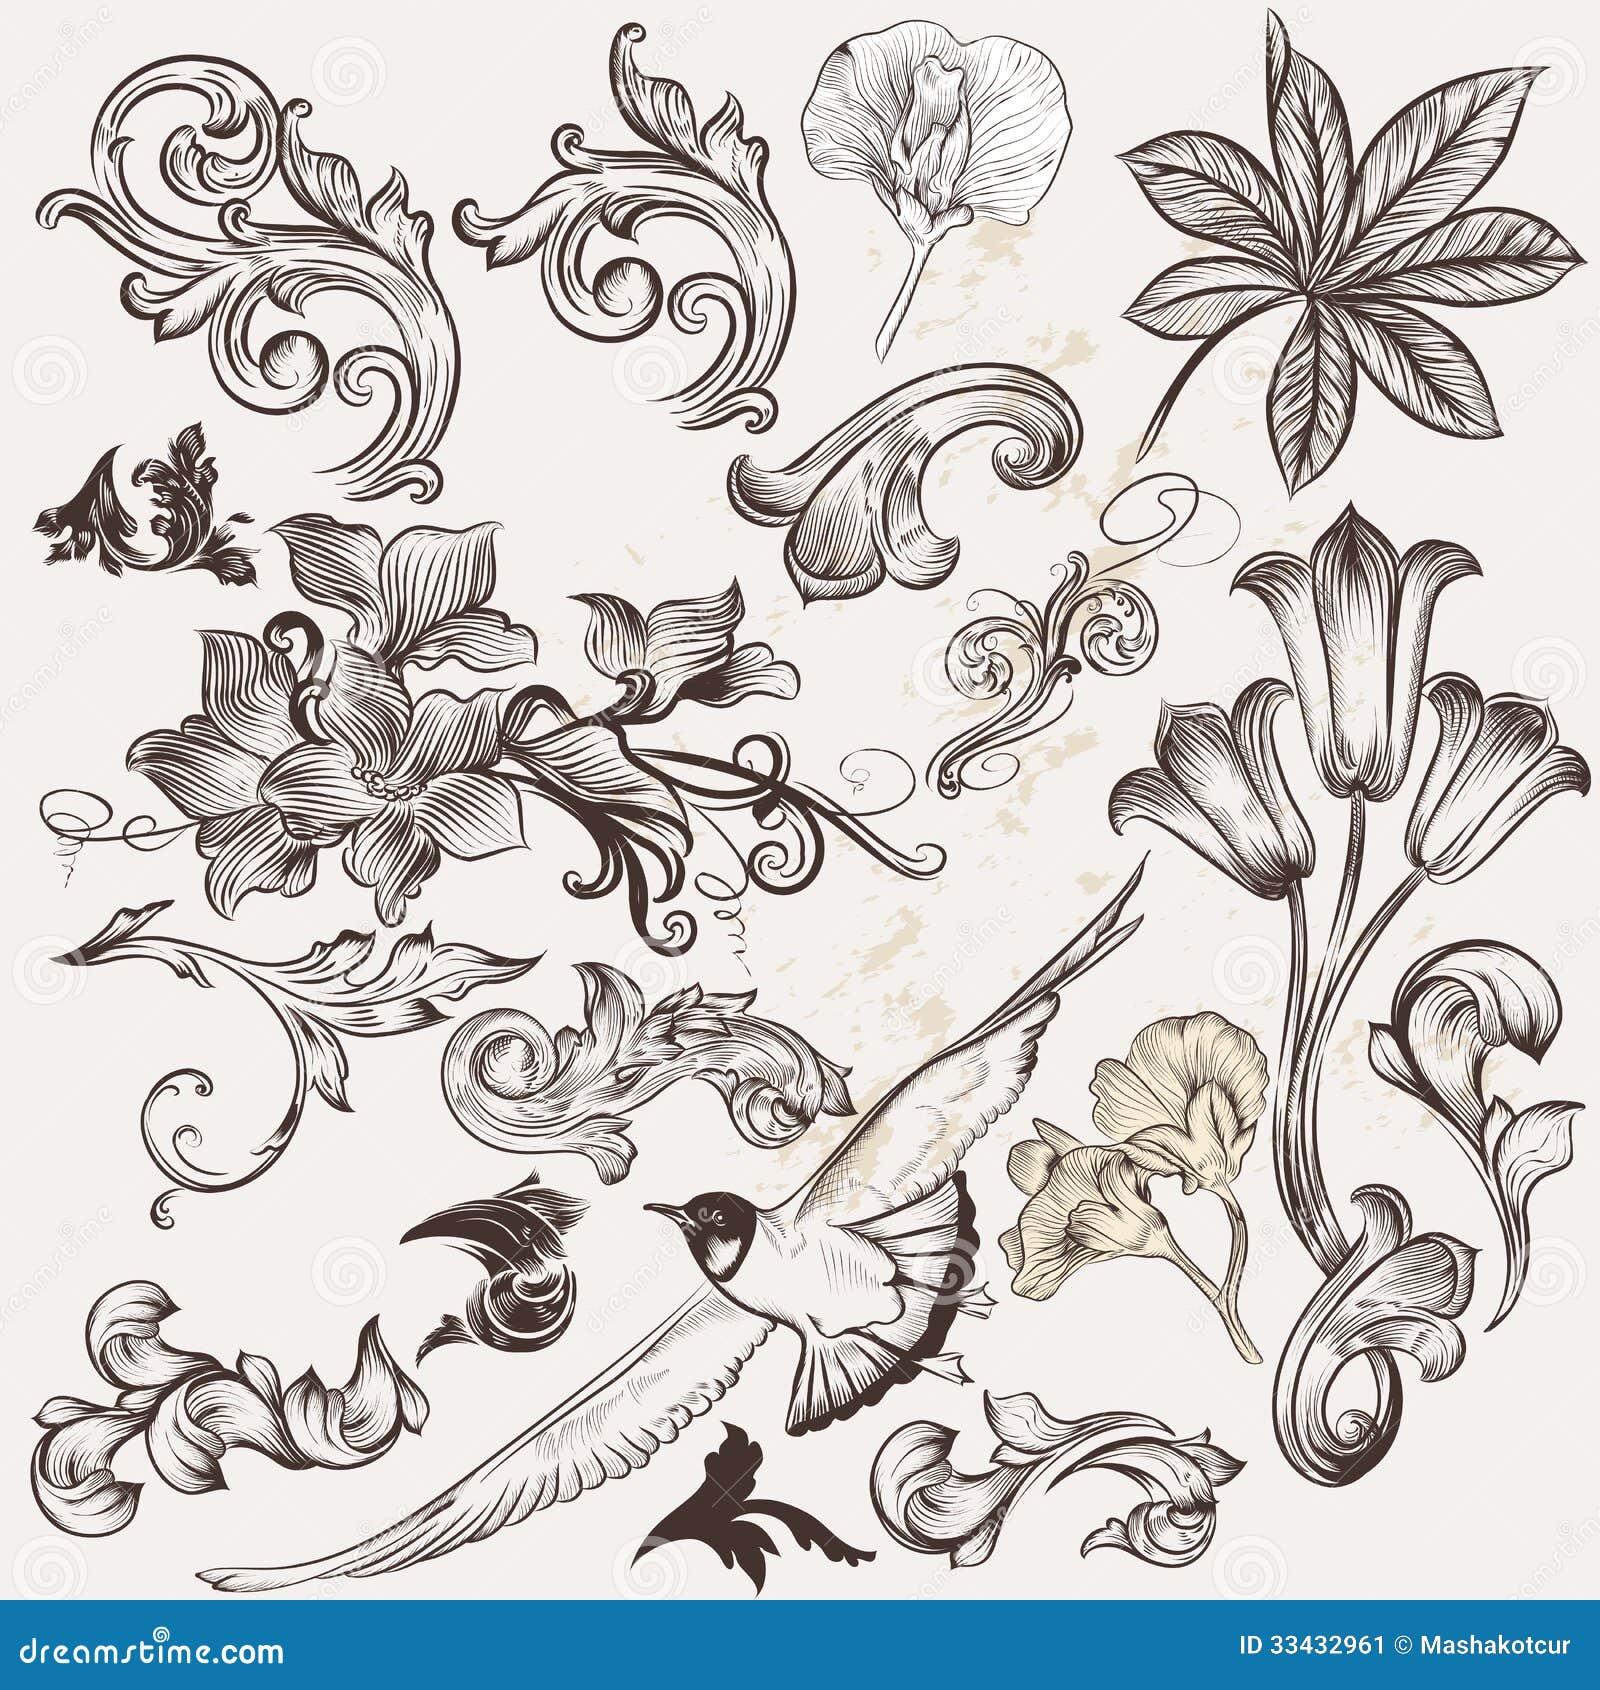 vector hand drawn calligraphic-#12